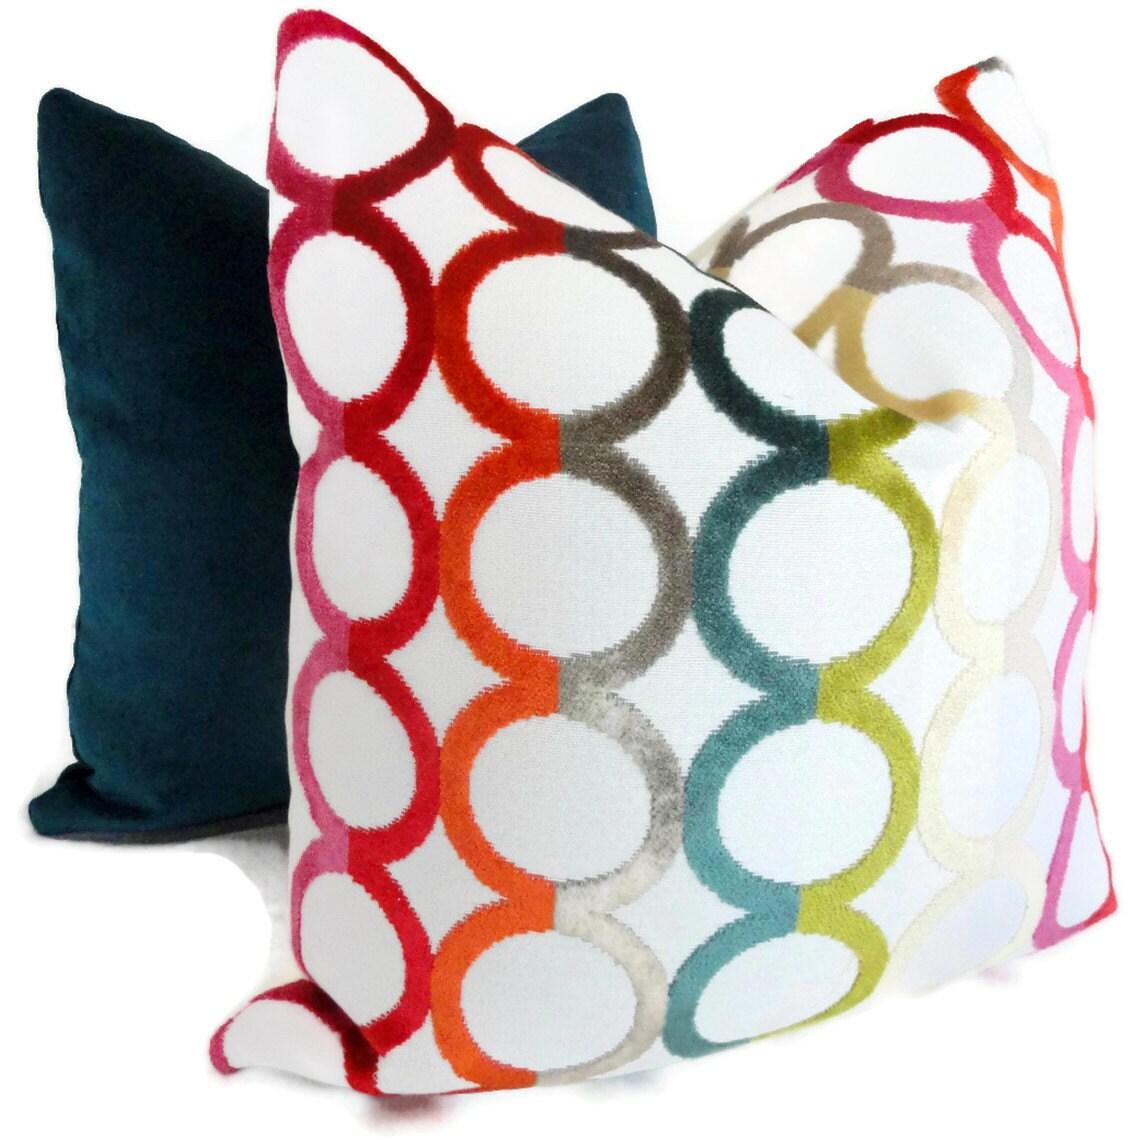 jonathan adler decorative pillow cover multicolor ringleader - 🔎zoom